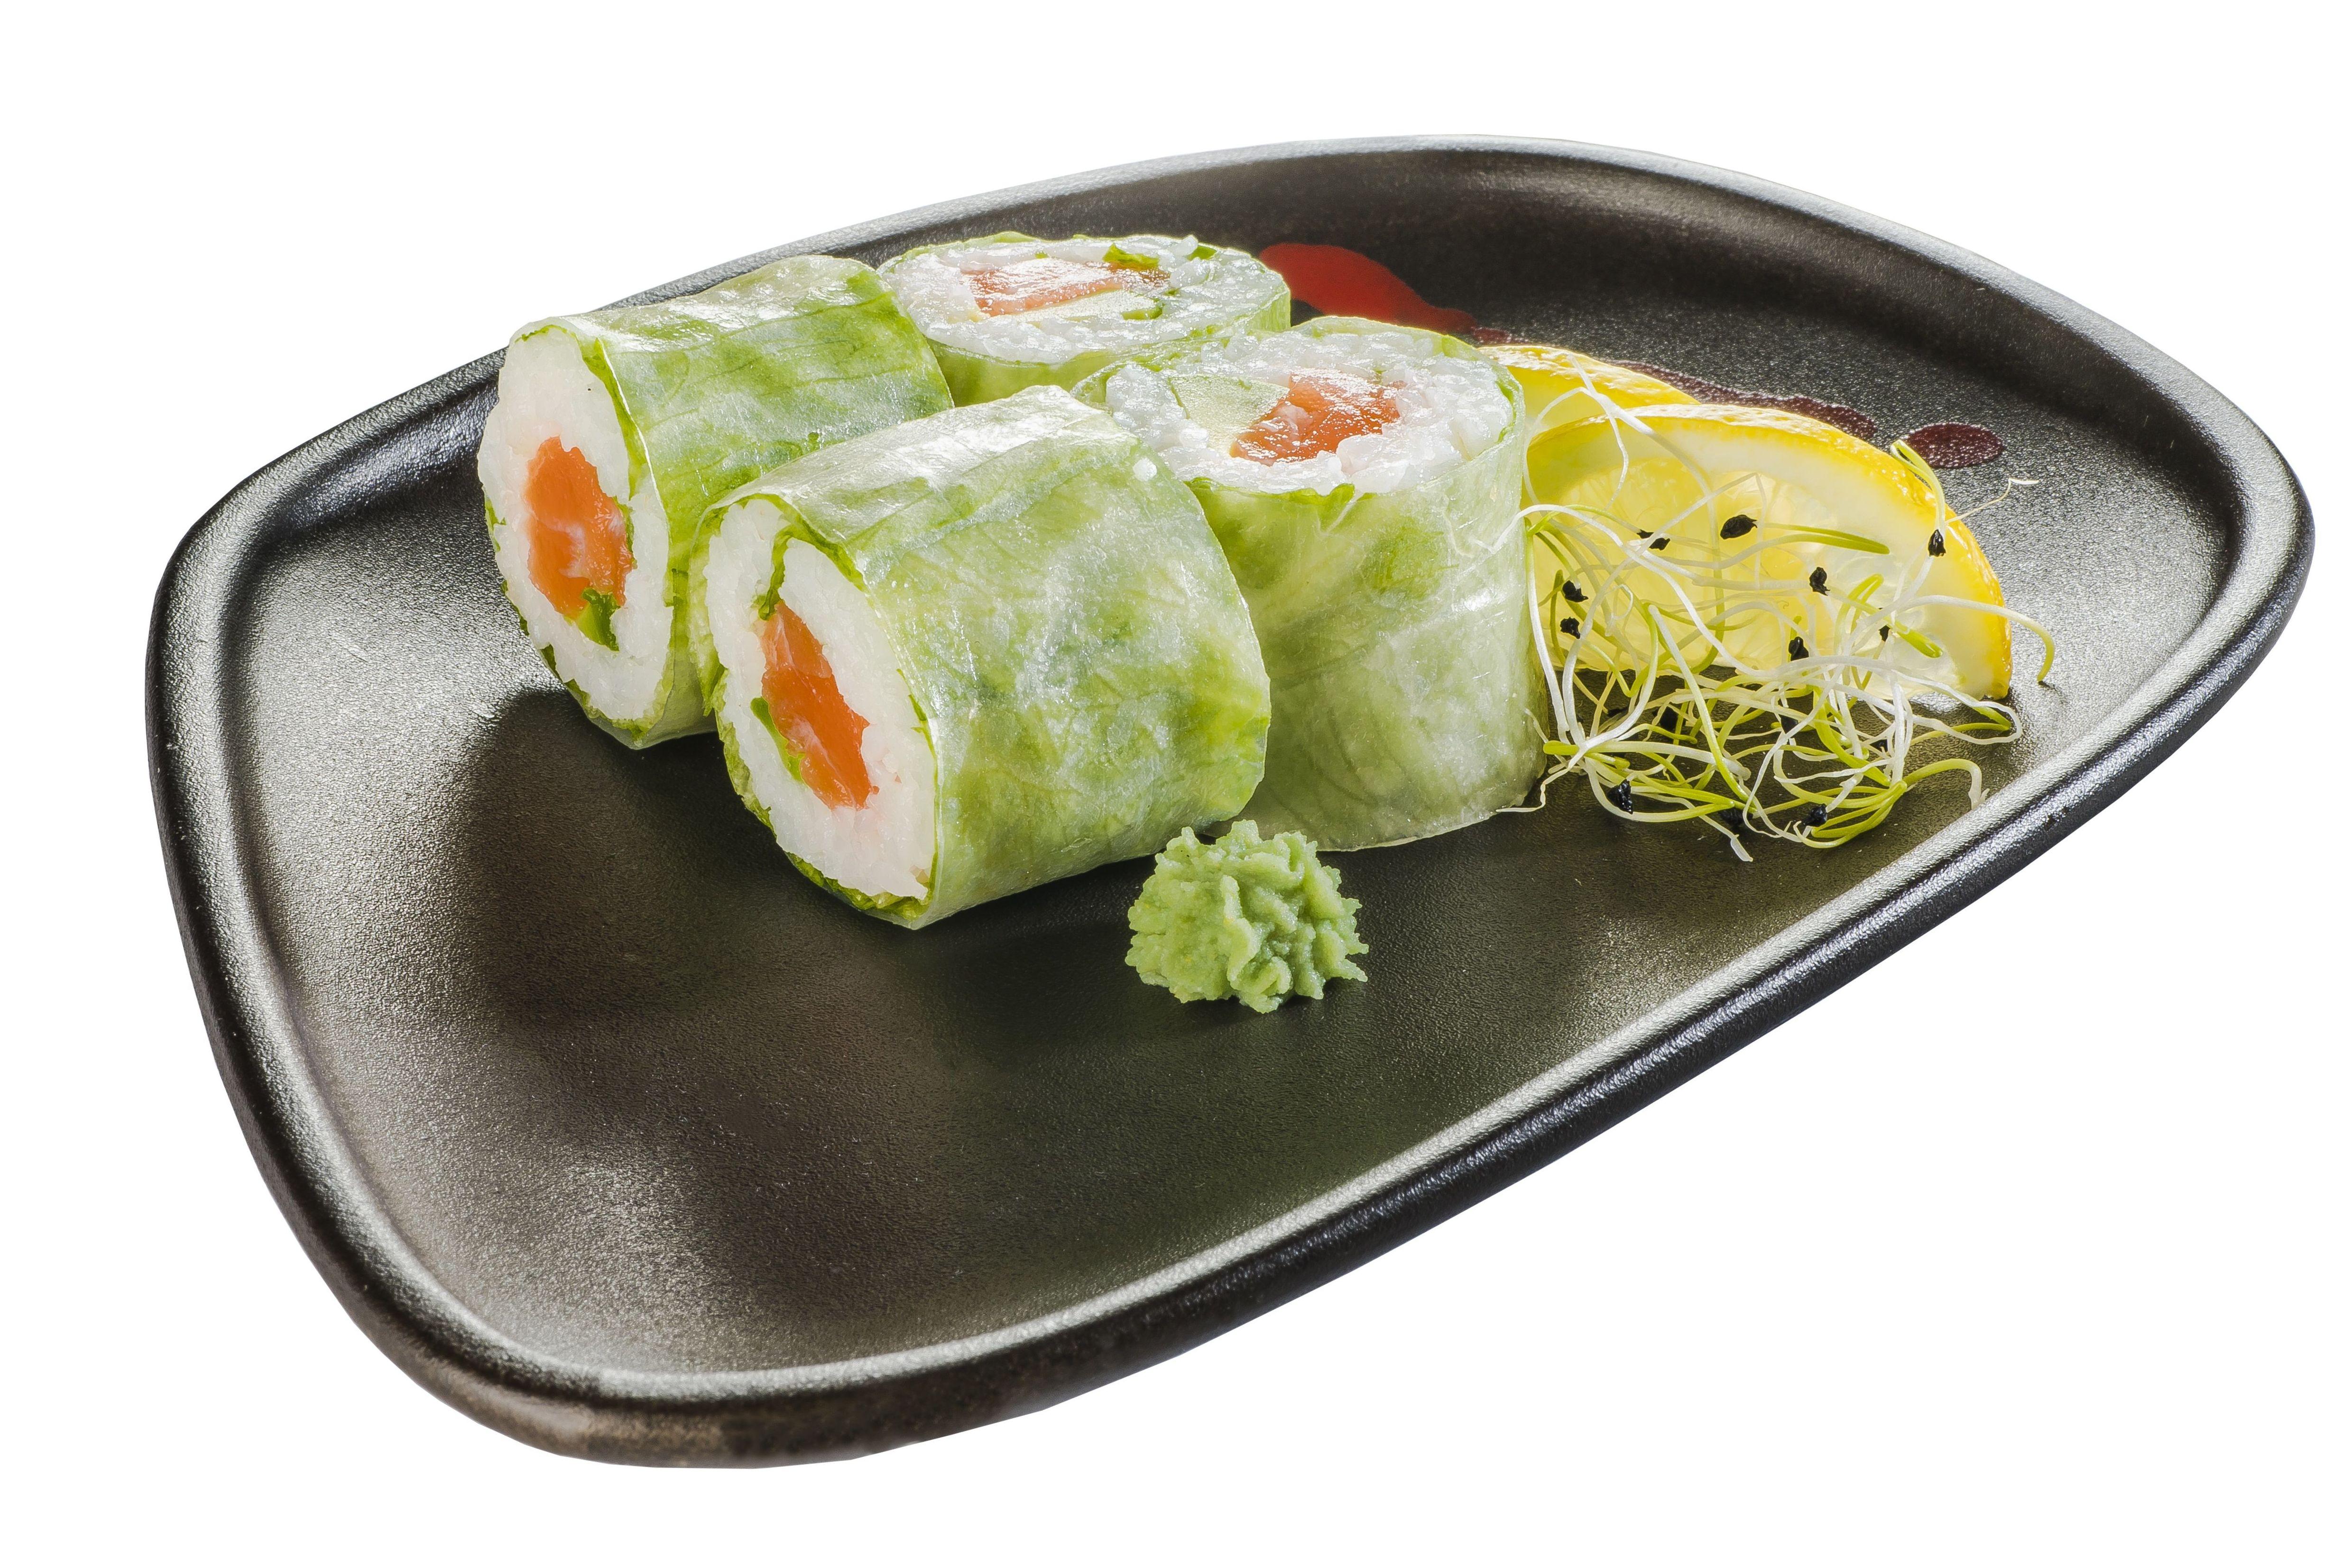 Cristal roll de salmón y aguacate (8u.)  6,50€: Carta de Restaurante Sowu